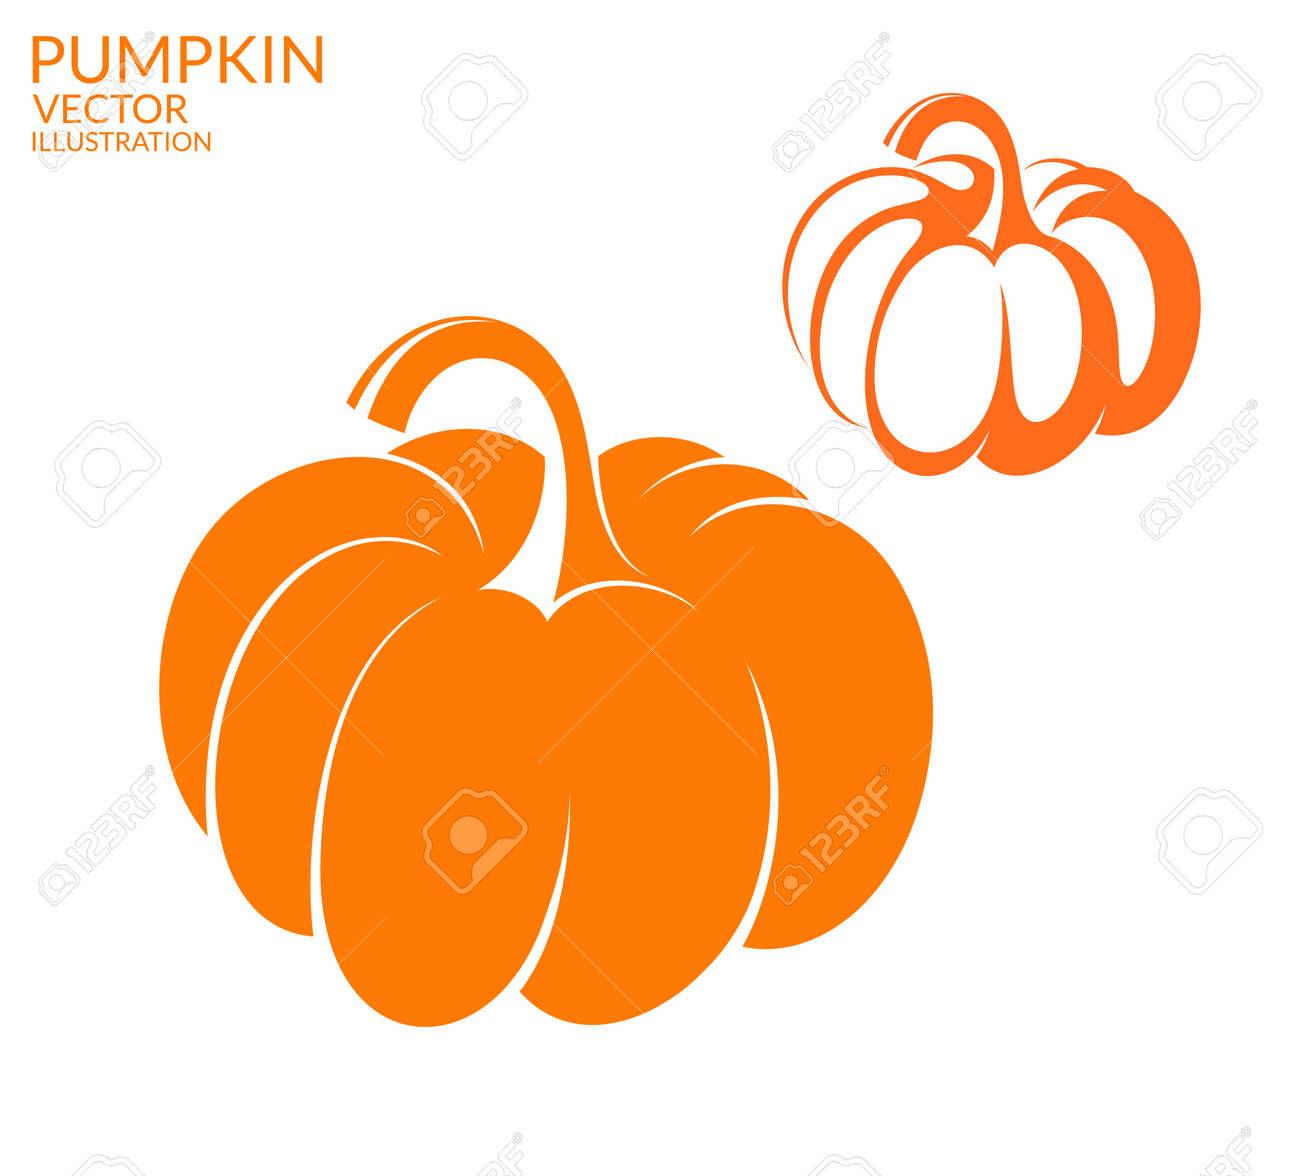 pumpkin royalty free cliparts vectors and stock illustration rh 123rf com vector pumpkin free victor pumpkin joe spencer